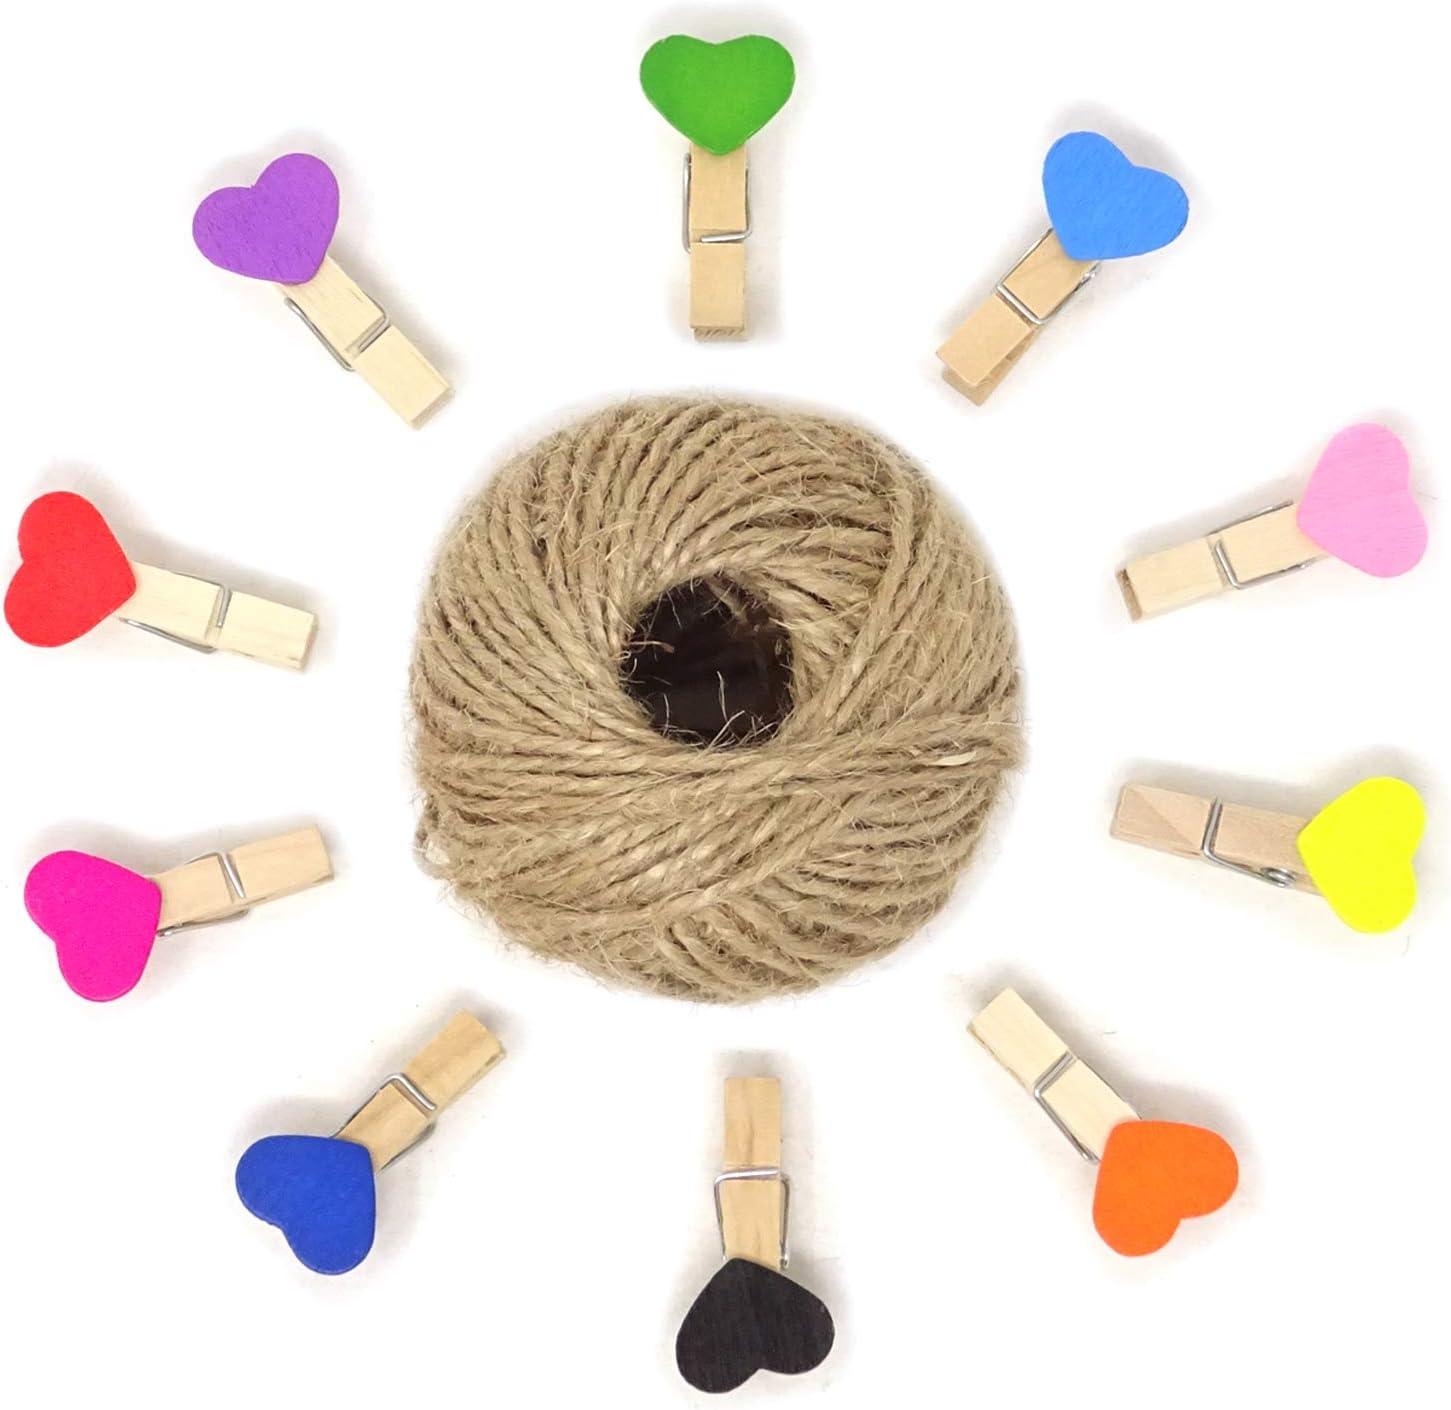 HONBAY 50PCS Ranking TOP14 3.5cm Mini Atlanta Mall Heart Shaped Colored Wooden Clothespins